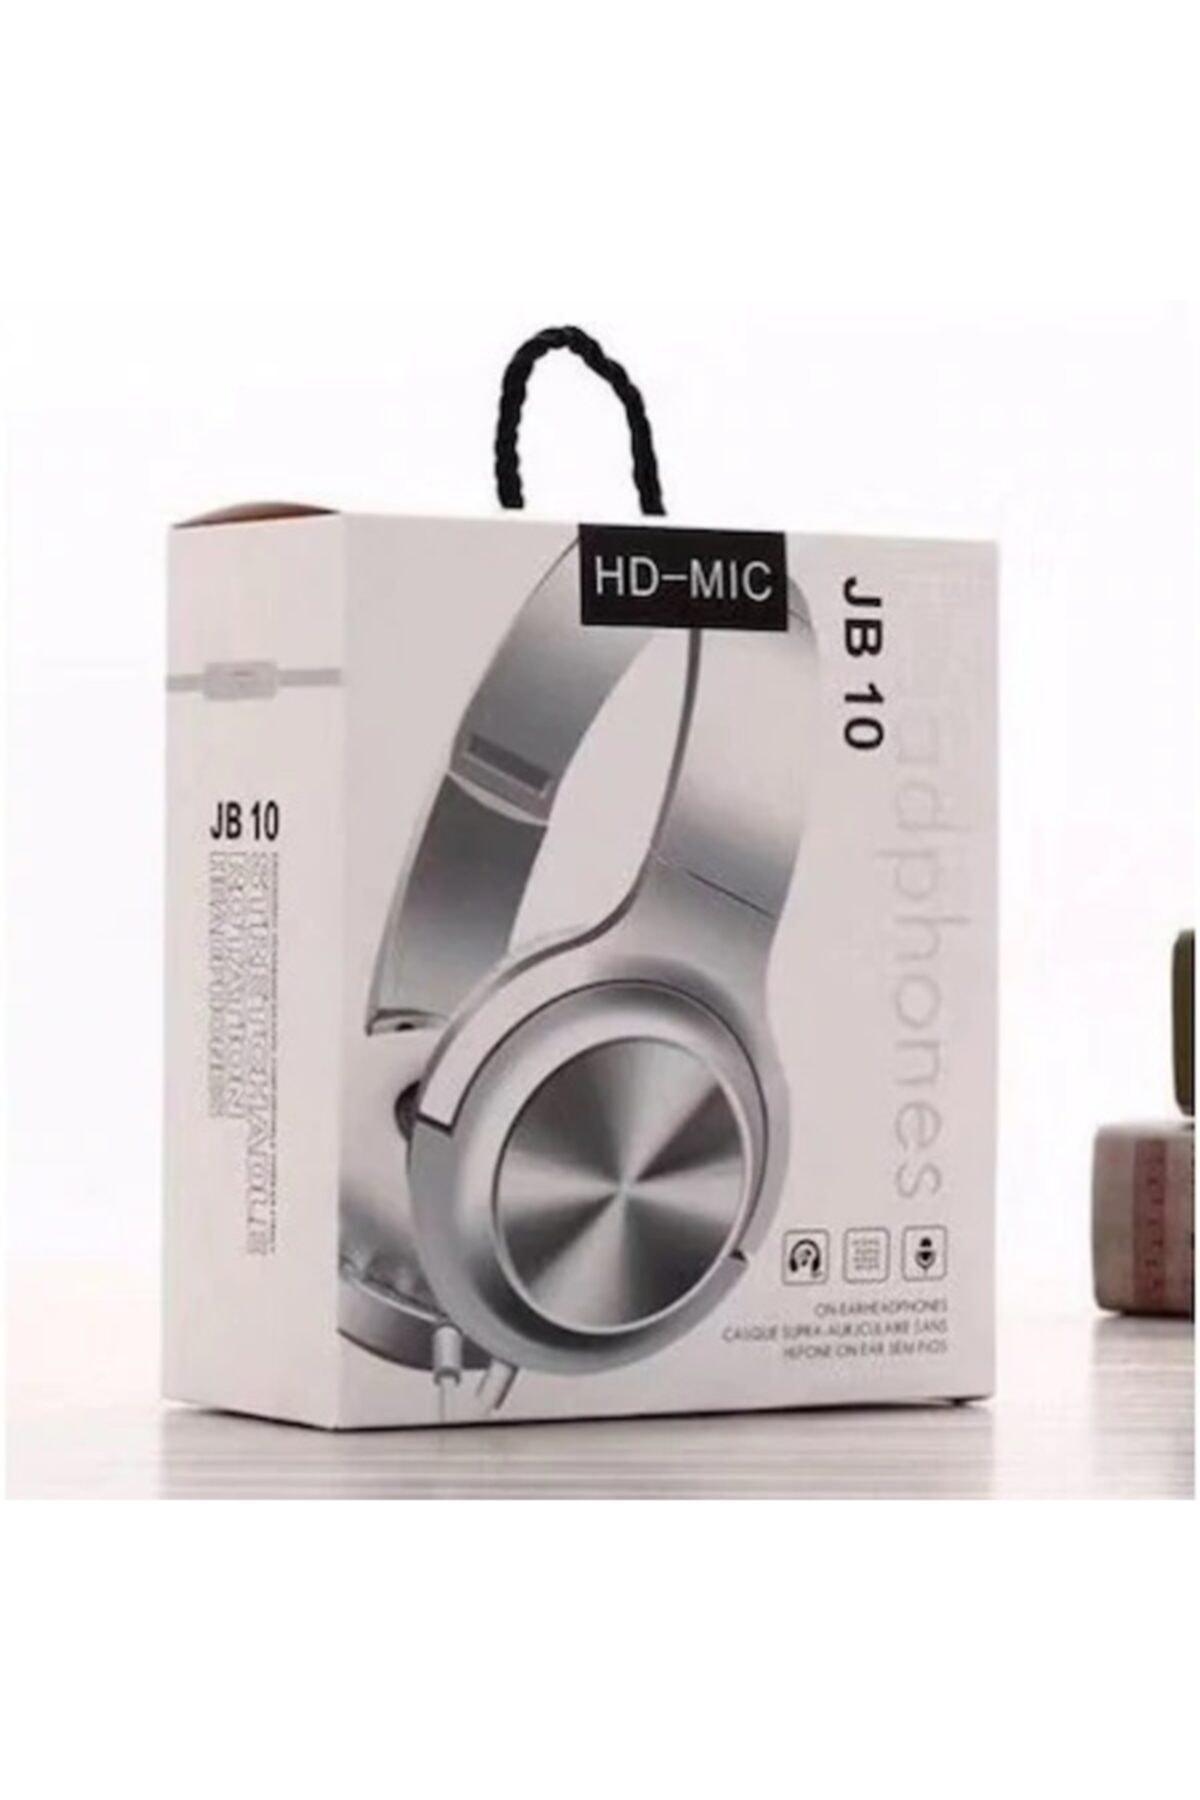 PSG - Jb10 Mikrofonlu Kulak Üstü Kulaklık Hd-mic 3.5mm Aux Girişli 1